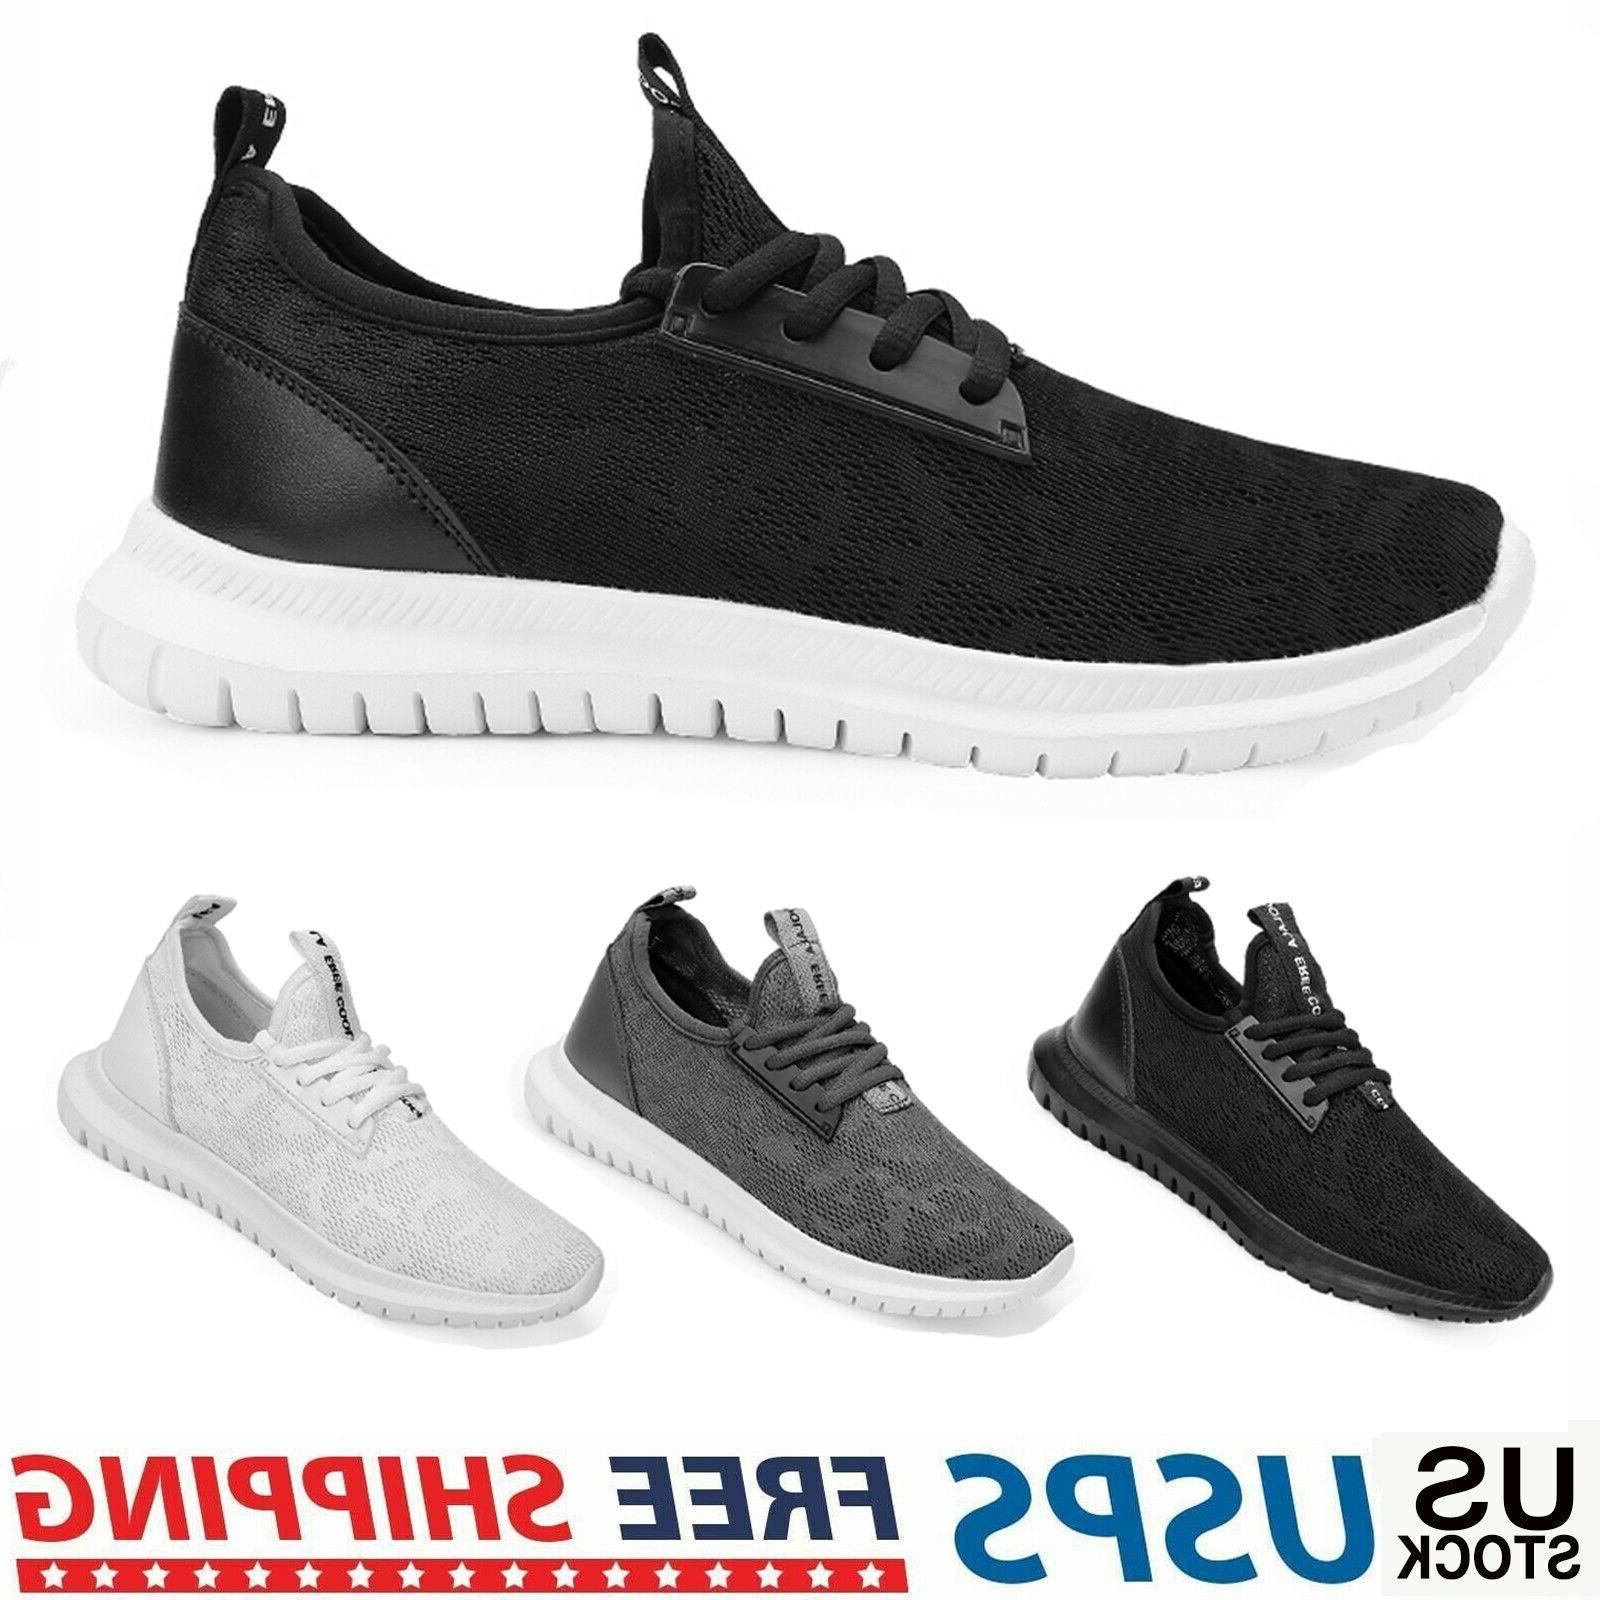 men s casual sneakers outdoor walking athletic